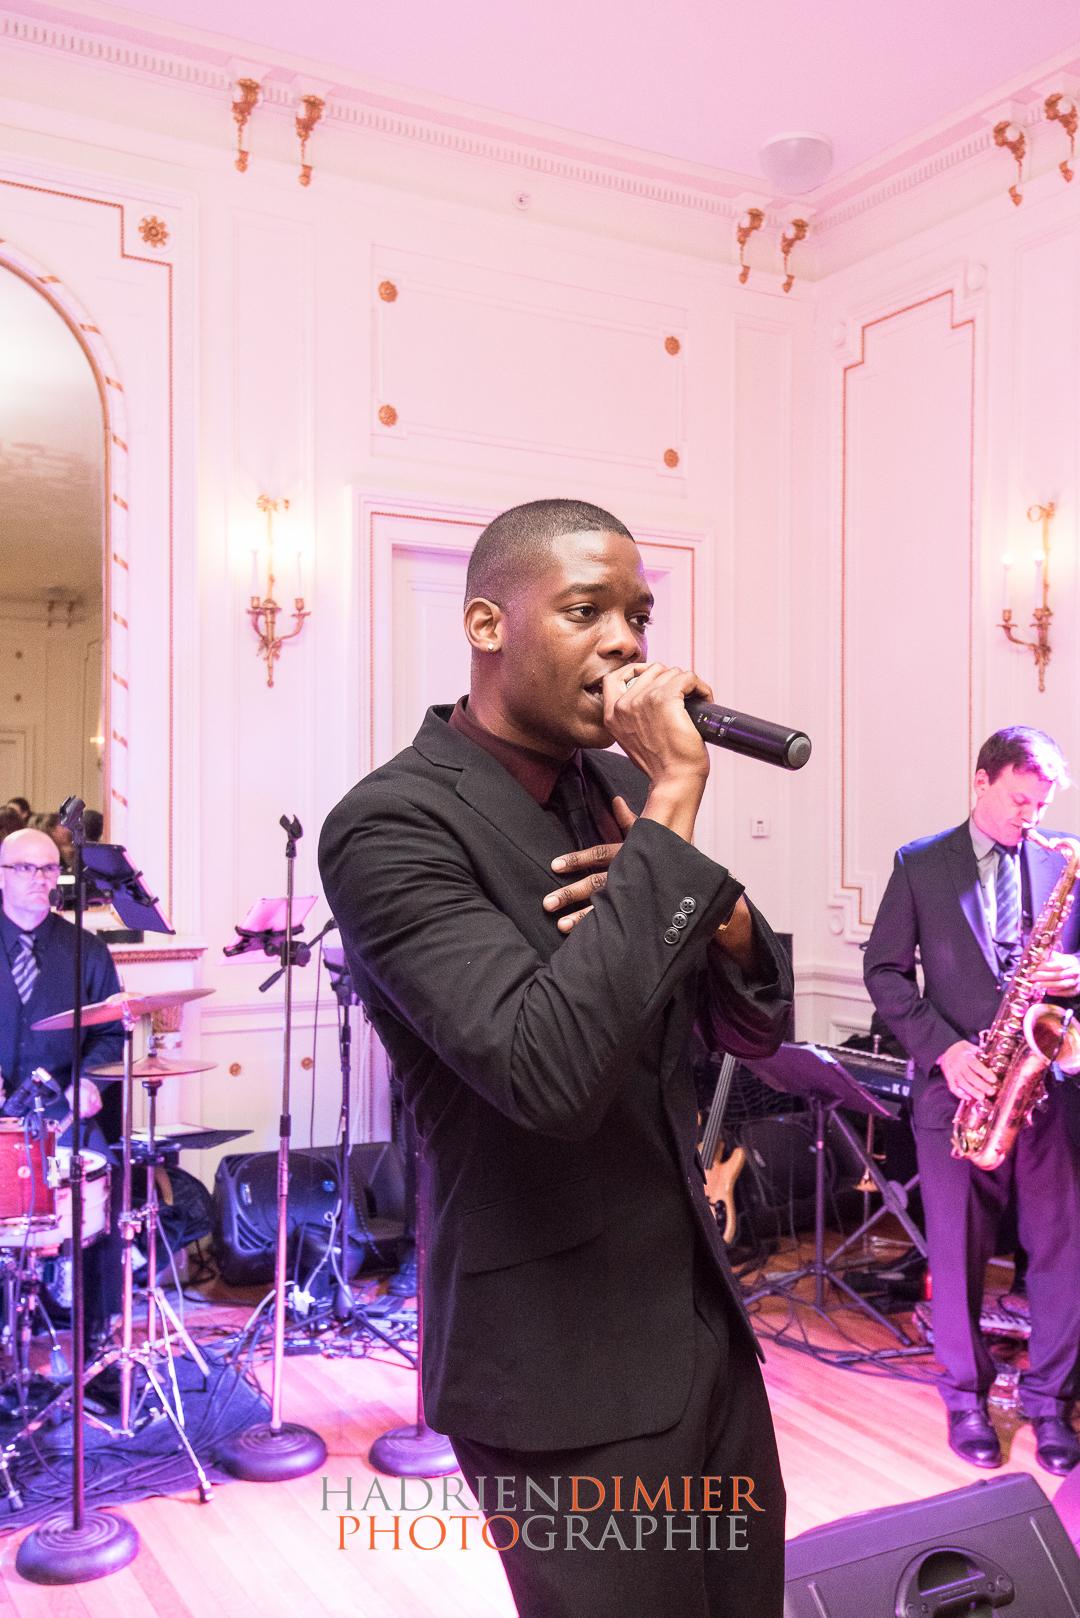 Wilson-Stevens-Productions-Splash-Band-Wedding-Hadrien Dimier Photographie-160422-00390